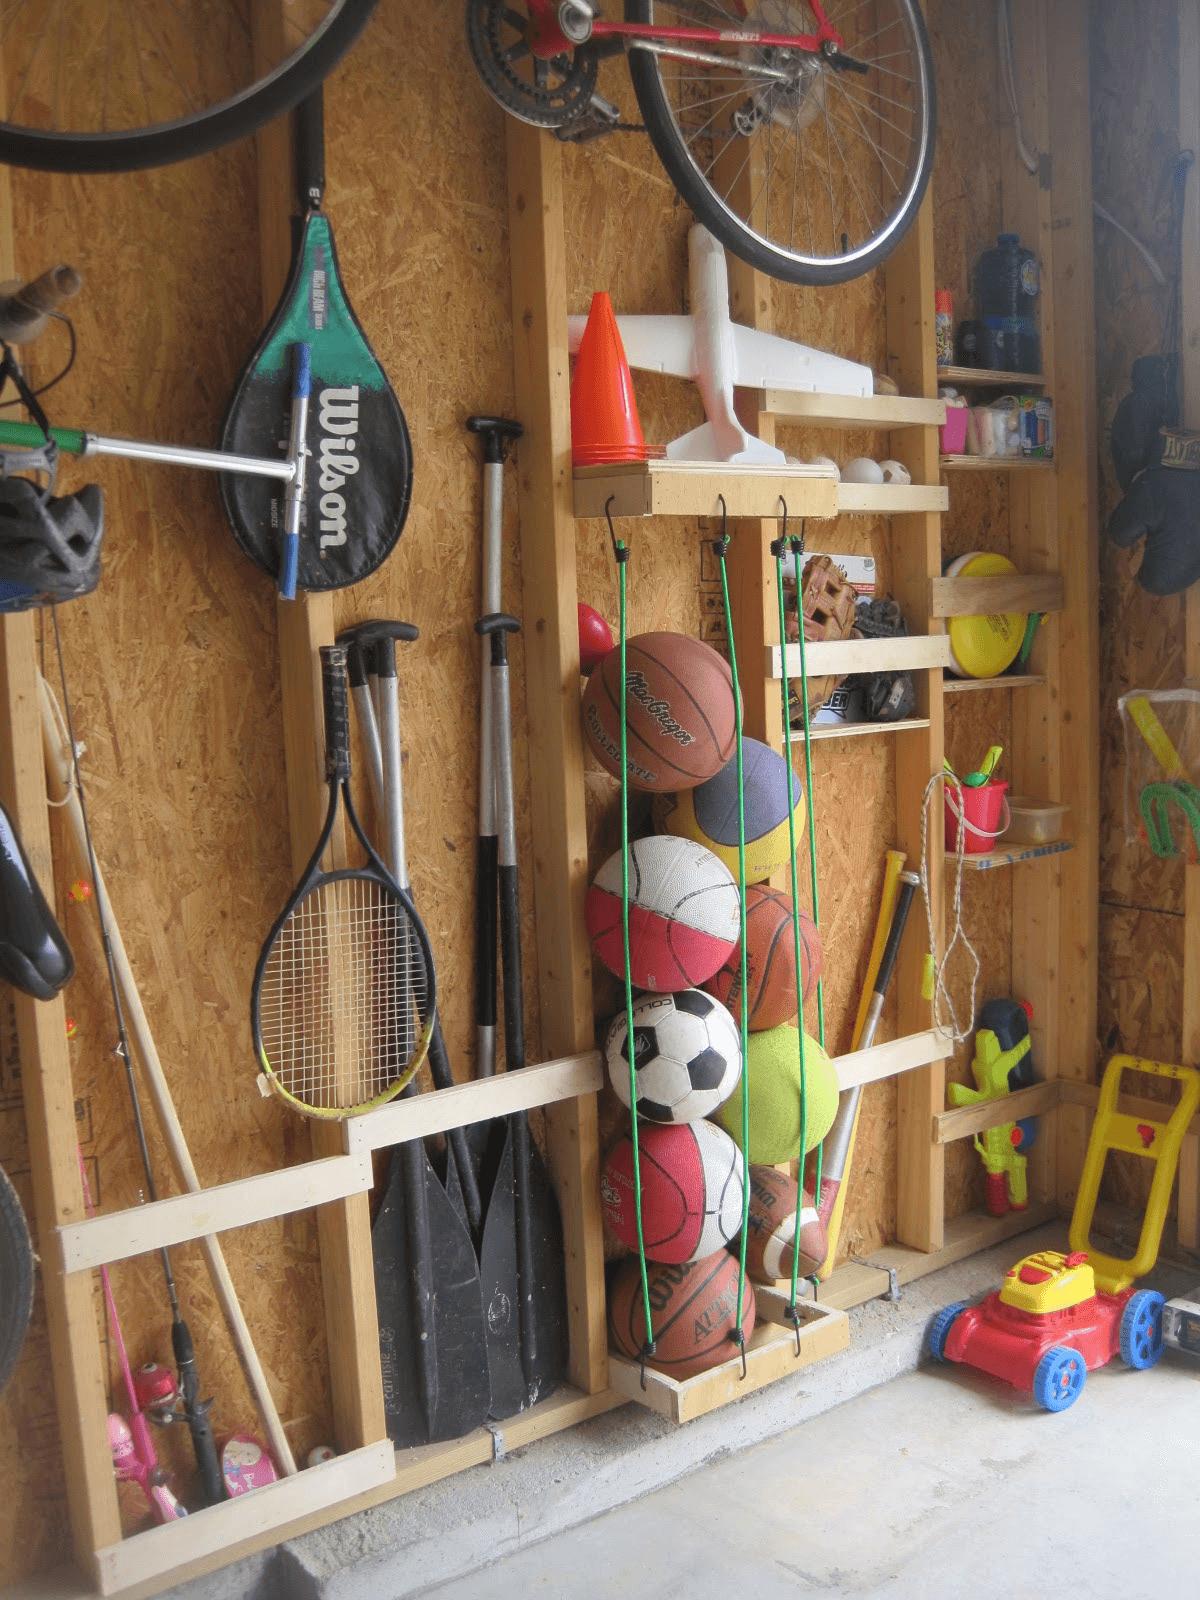 Creative garage ball holder